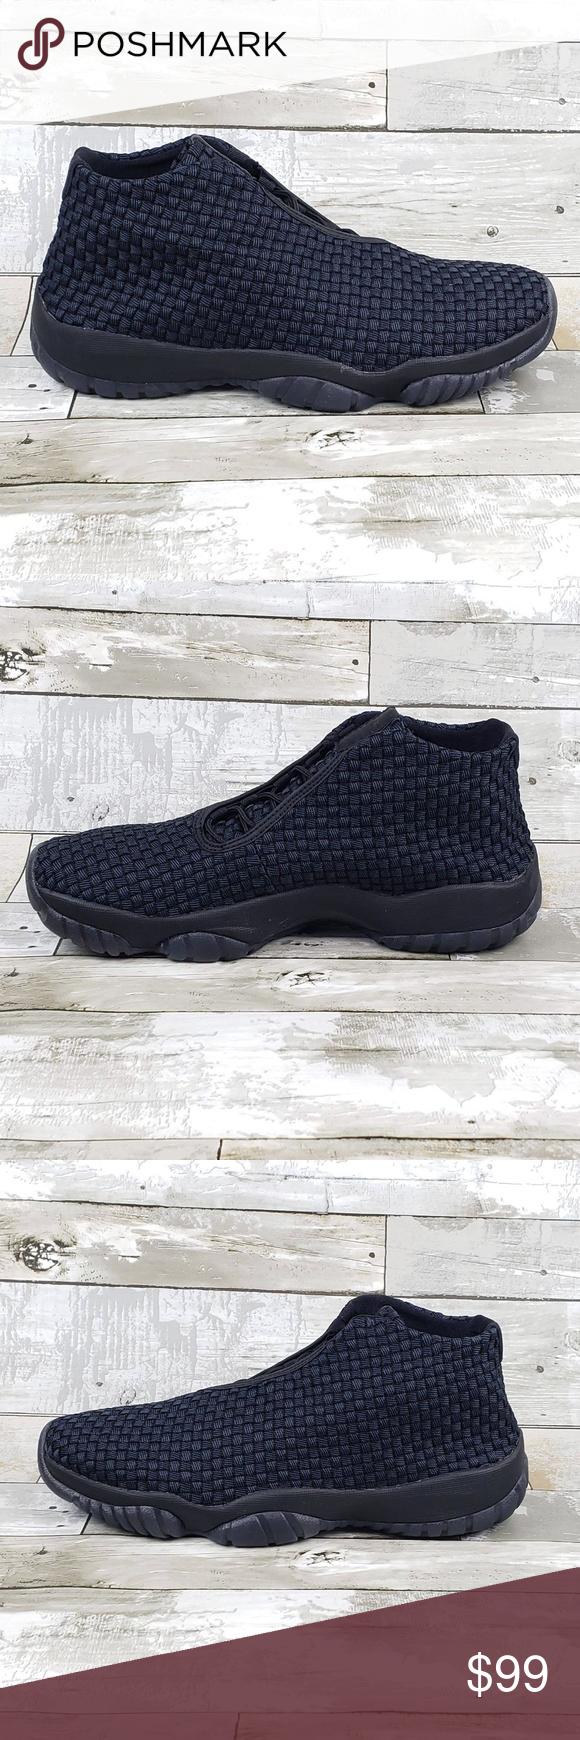 san francisco ddc76 ac1dd Nike Air Jordan Future Mens Shoes Black Anthracite Nike Air Jordan Future  Mens Shoes Black Anthracite